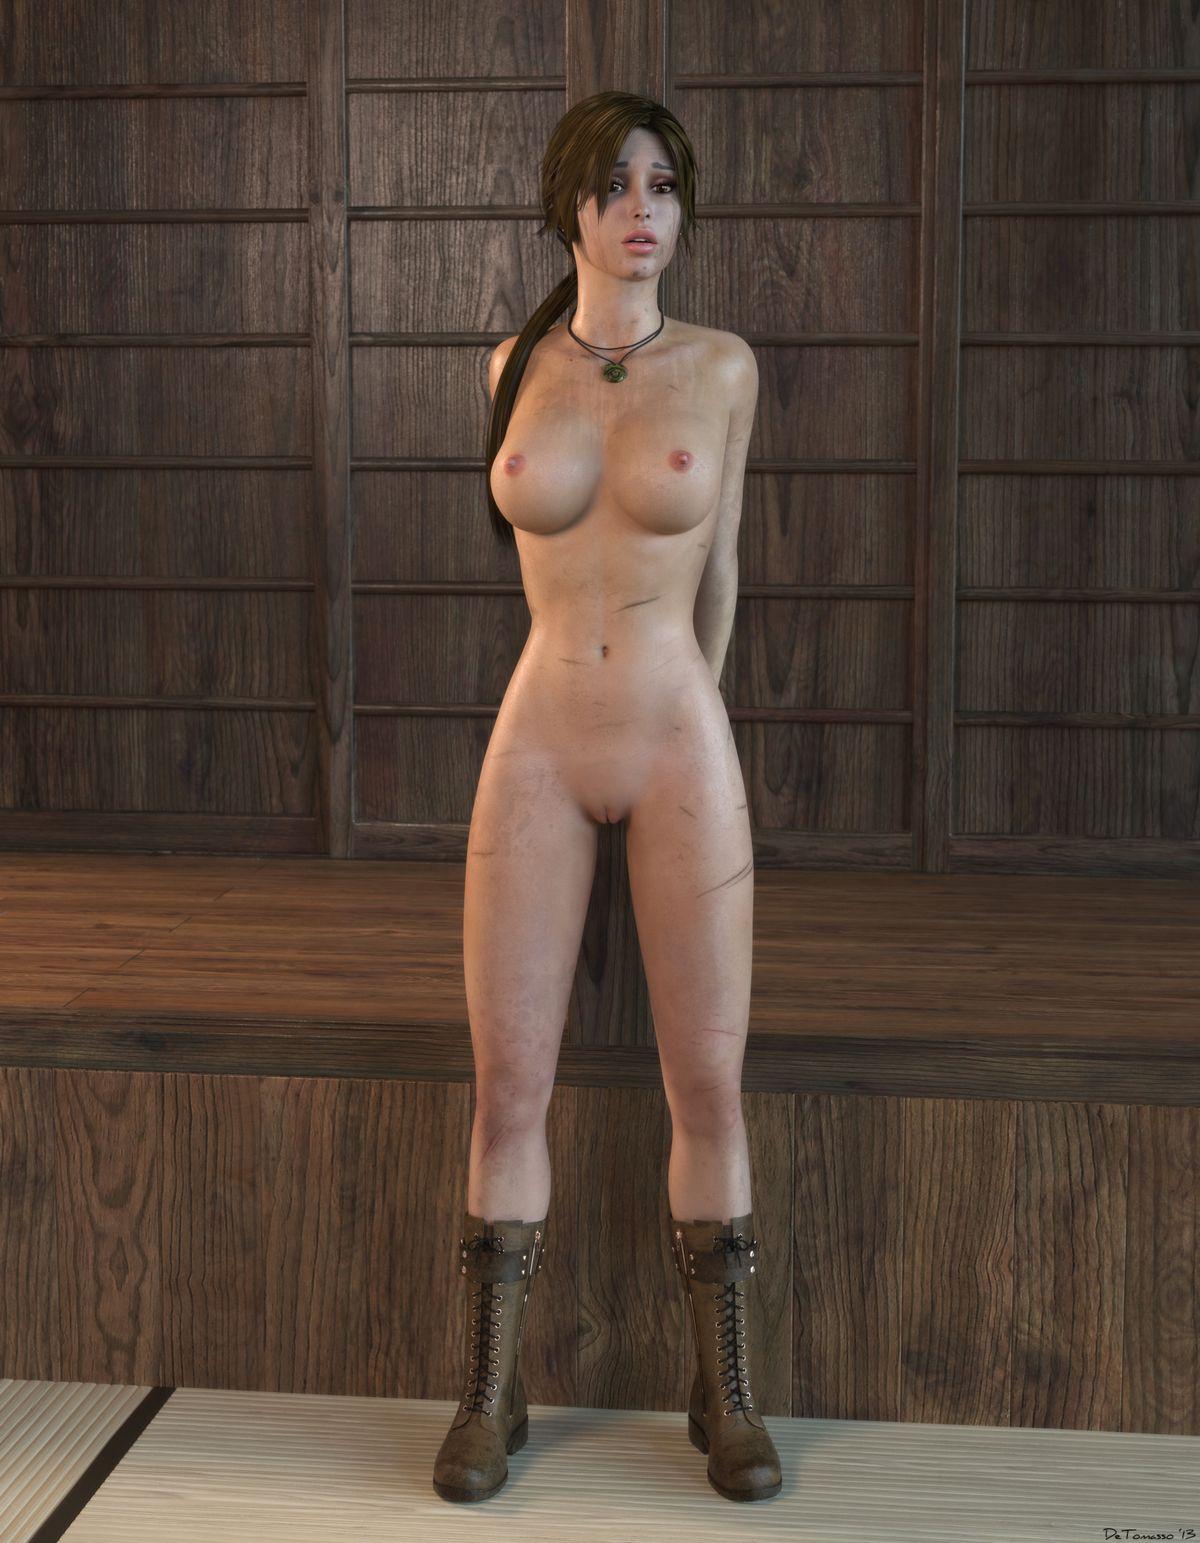 Tomb raider nude scene